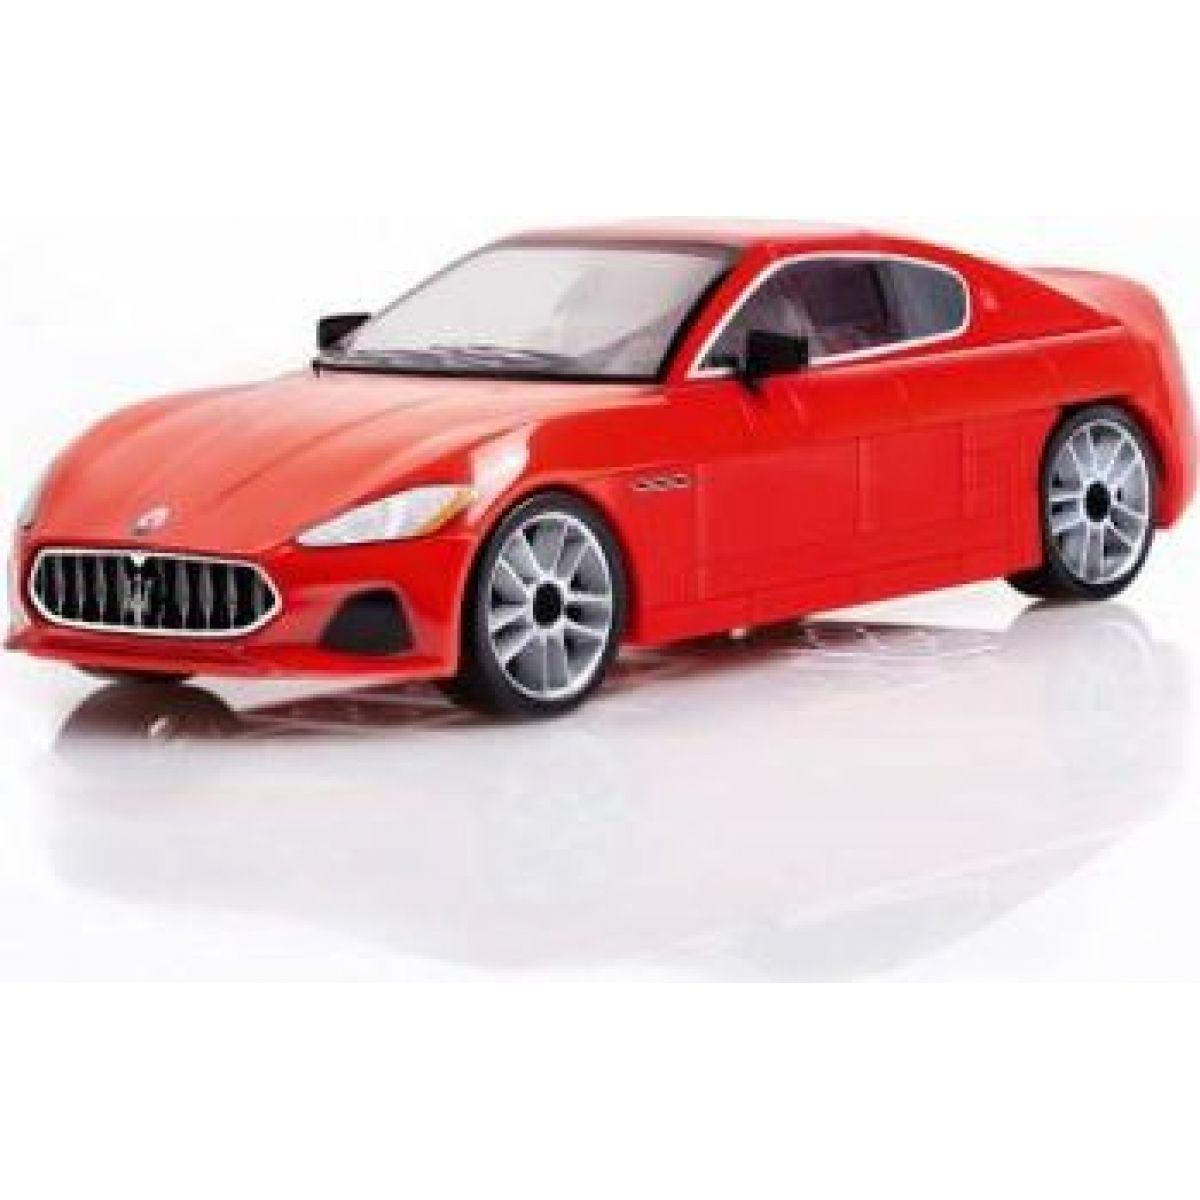 Cobi 24561 Maserati Gran Turismo 1:35 červený - Poškozený obal